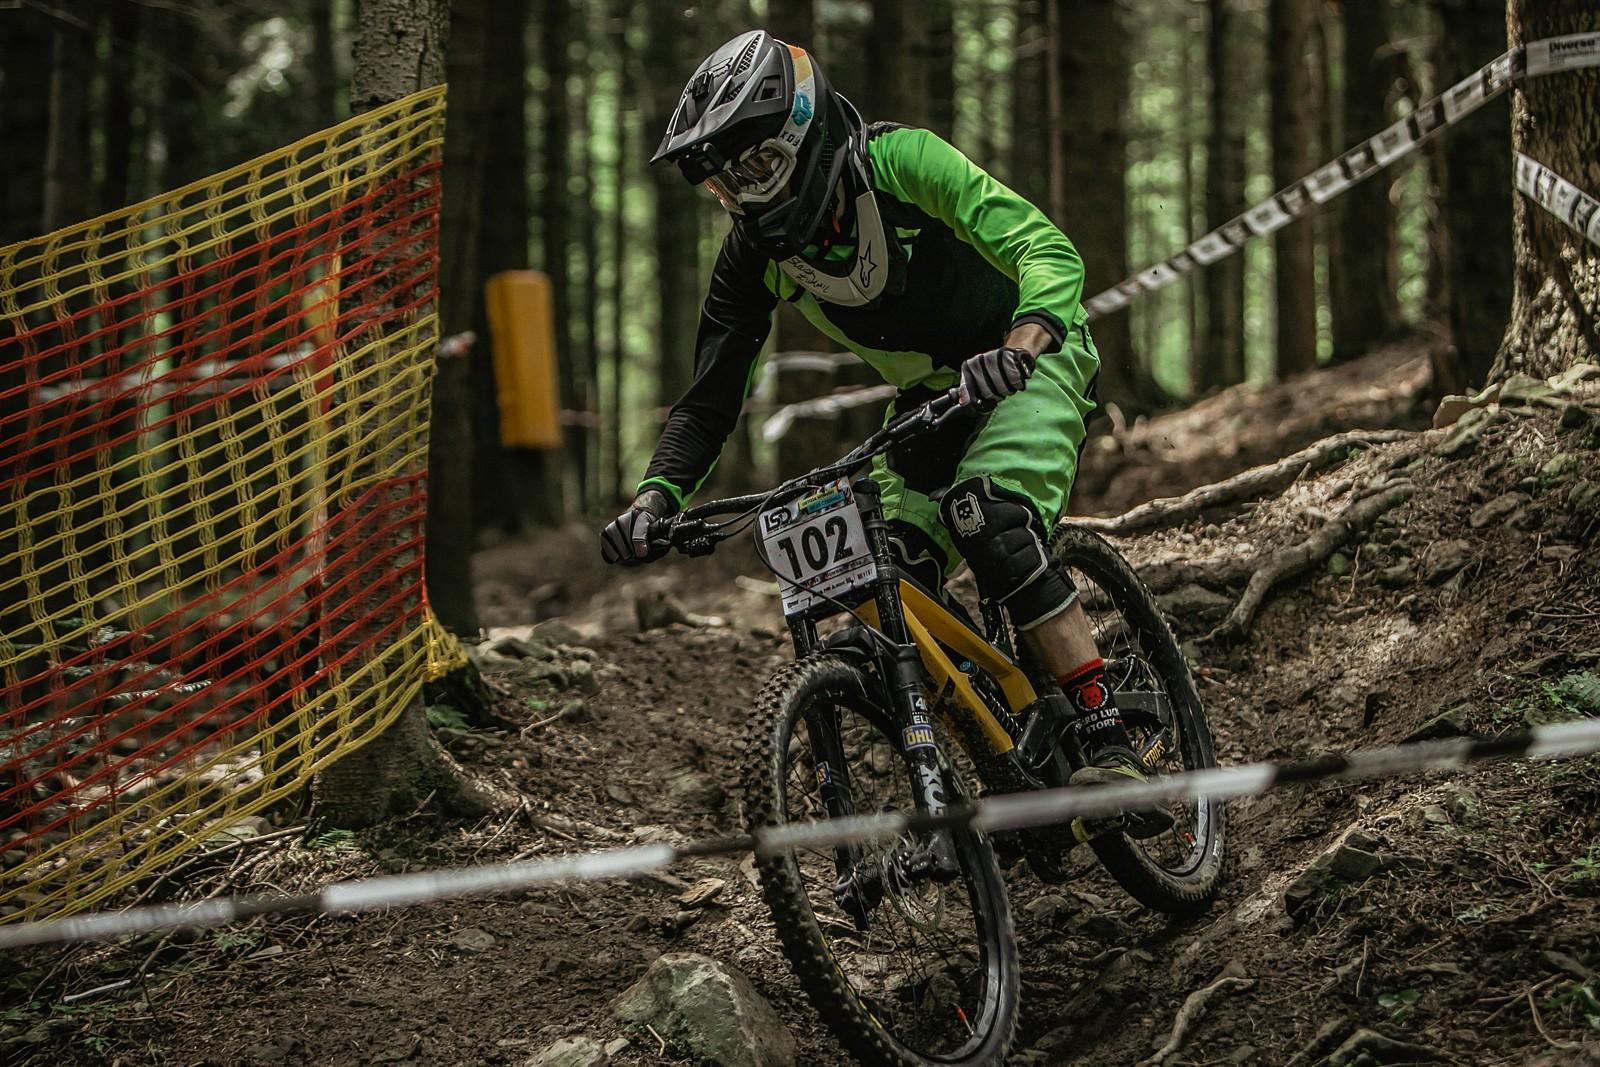 Local Series od Downhill 3 - bartek_zgr - Mountain Biking Pictures - Vital MTB